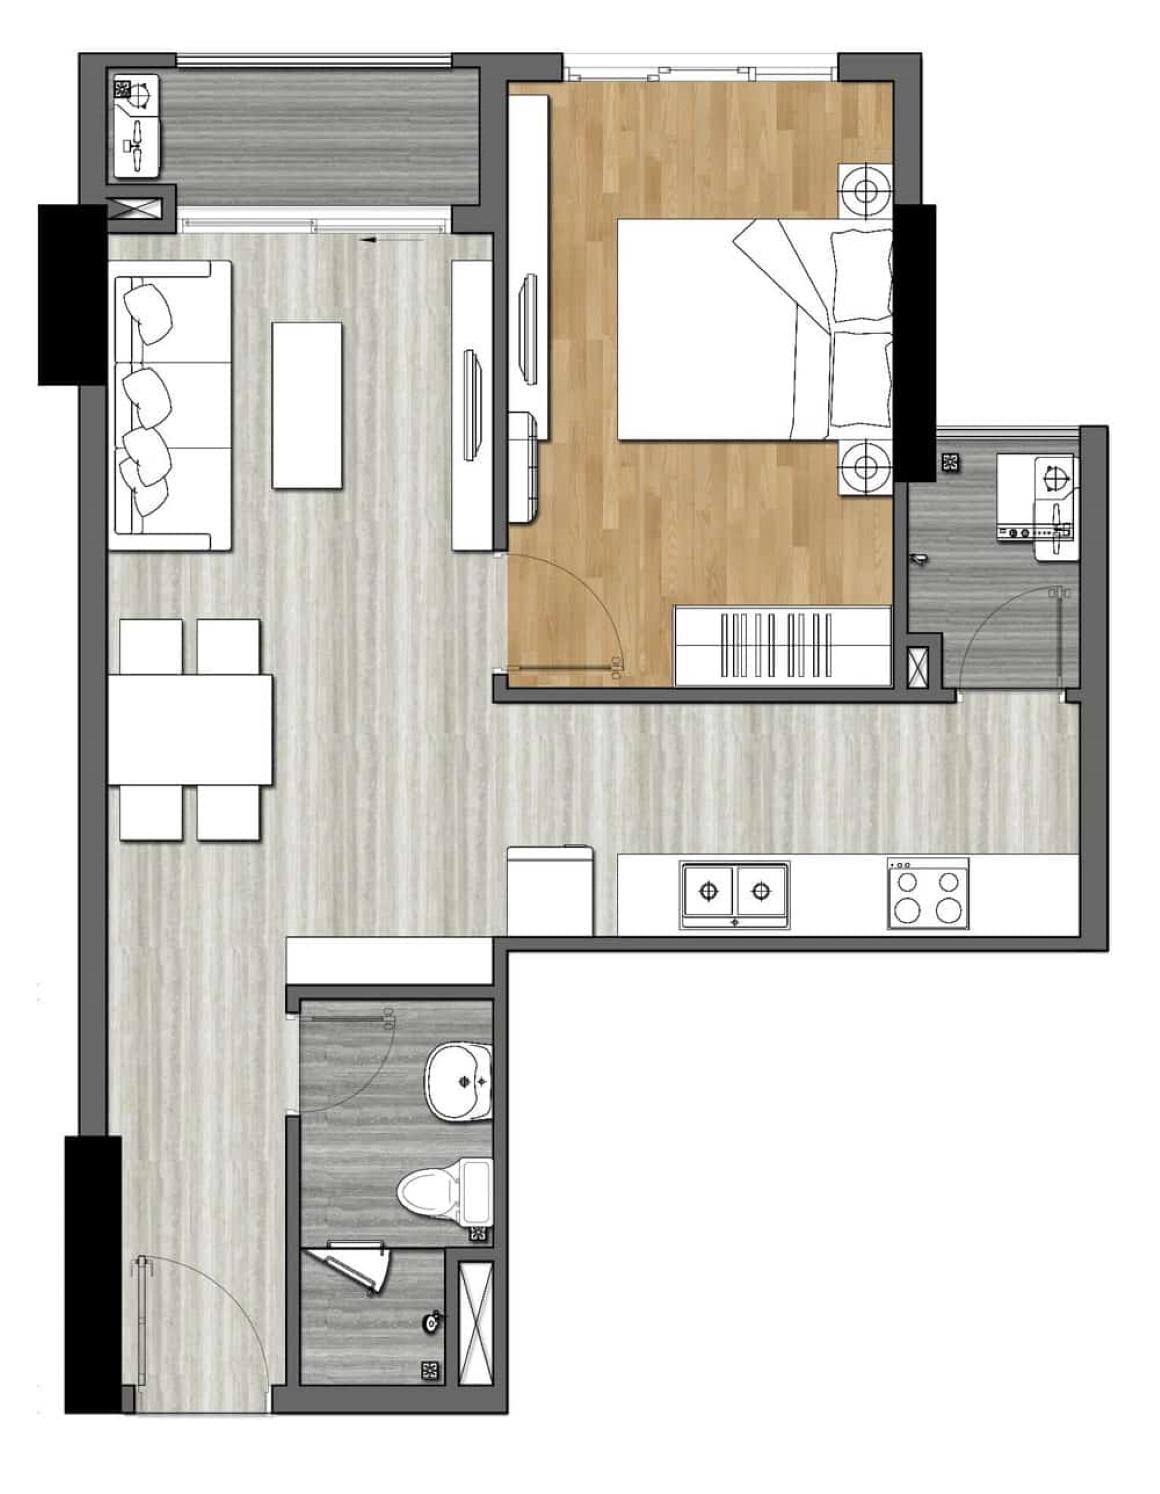 Thiết kế căn hộ New Galaxy - 1PN